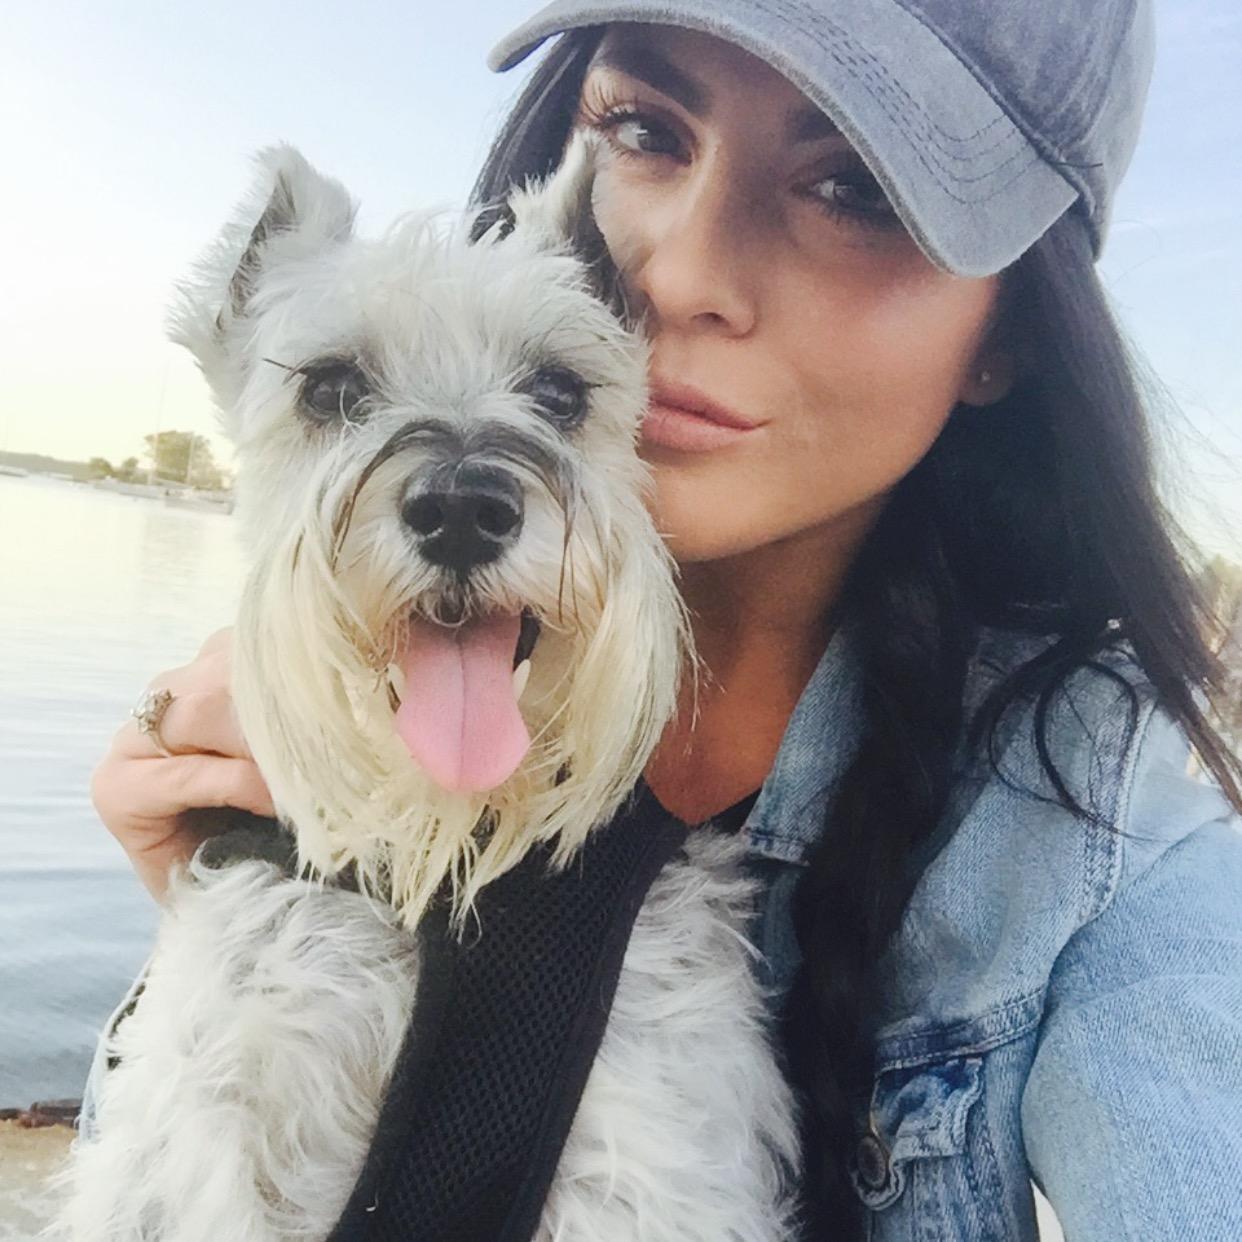 Casten's dog day care